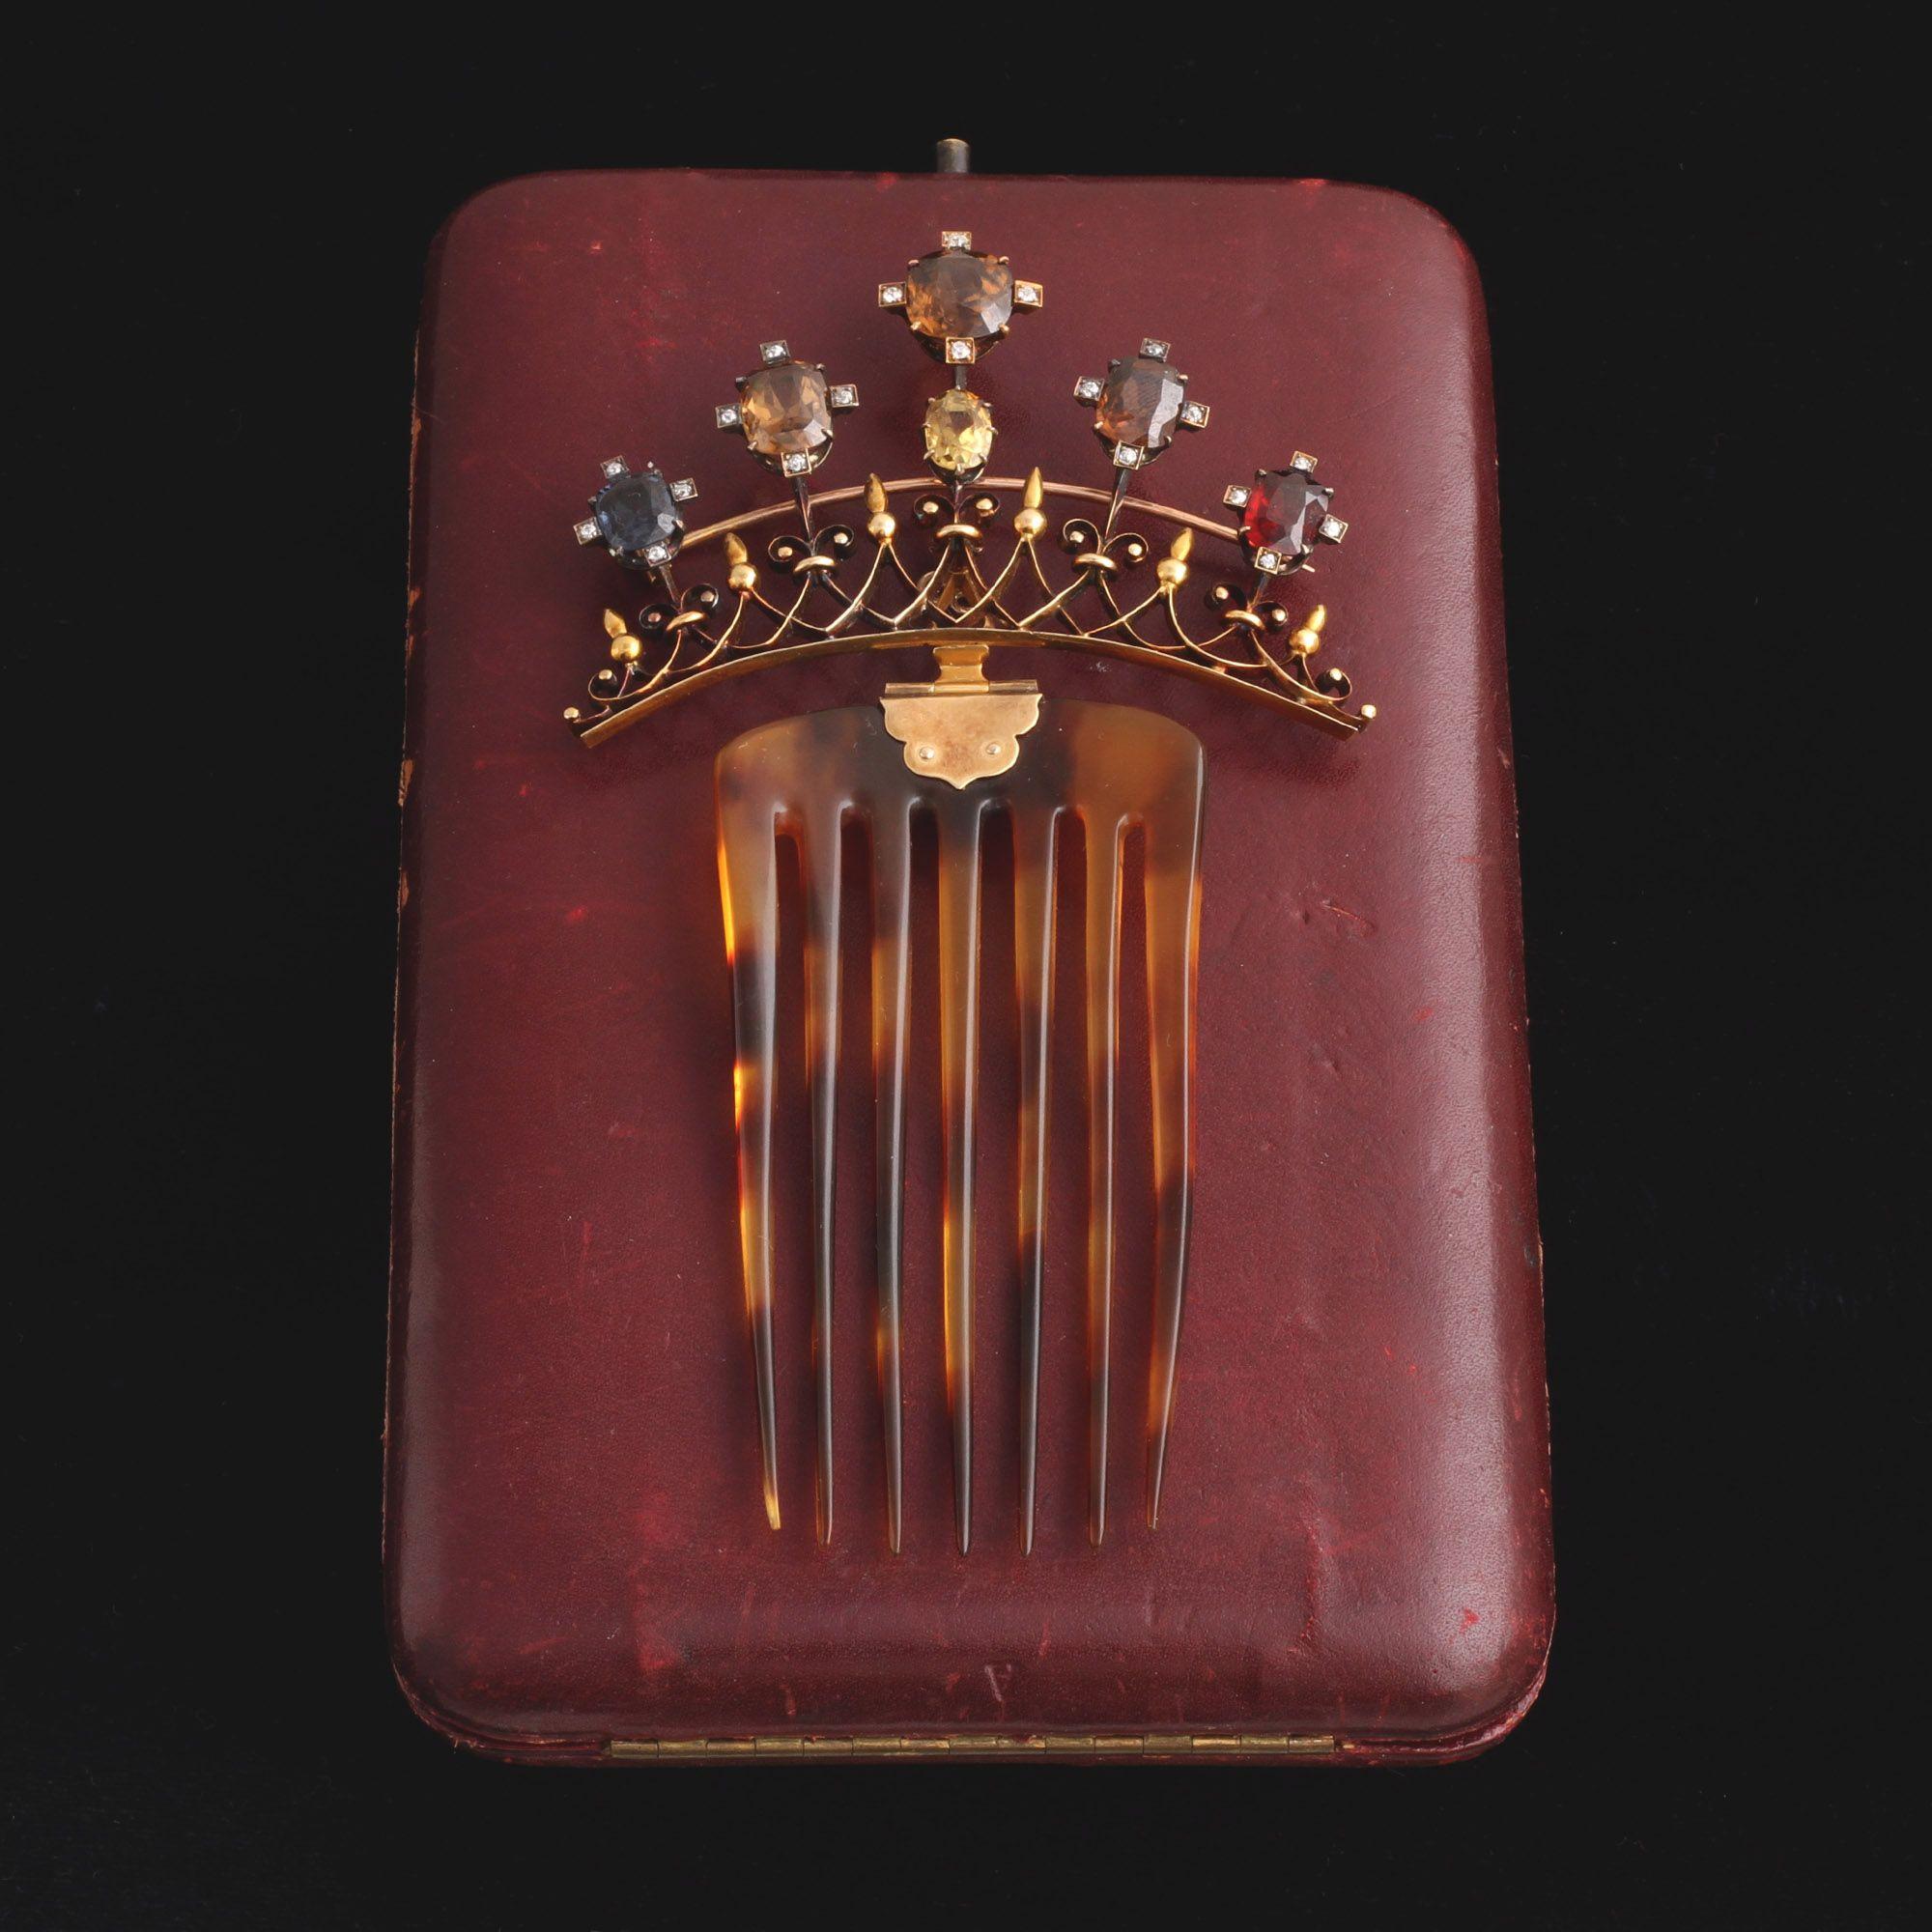 1920s Gemstone Hair Comb/Brooch in Original Box